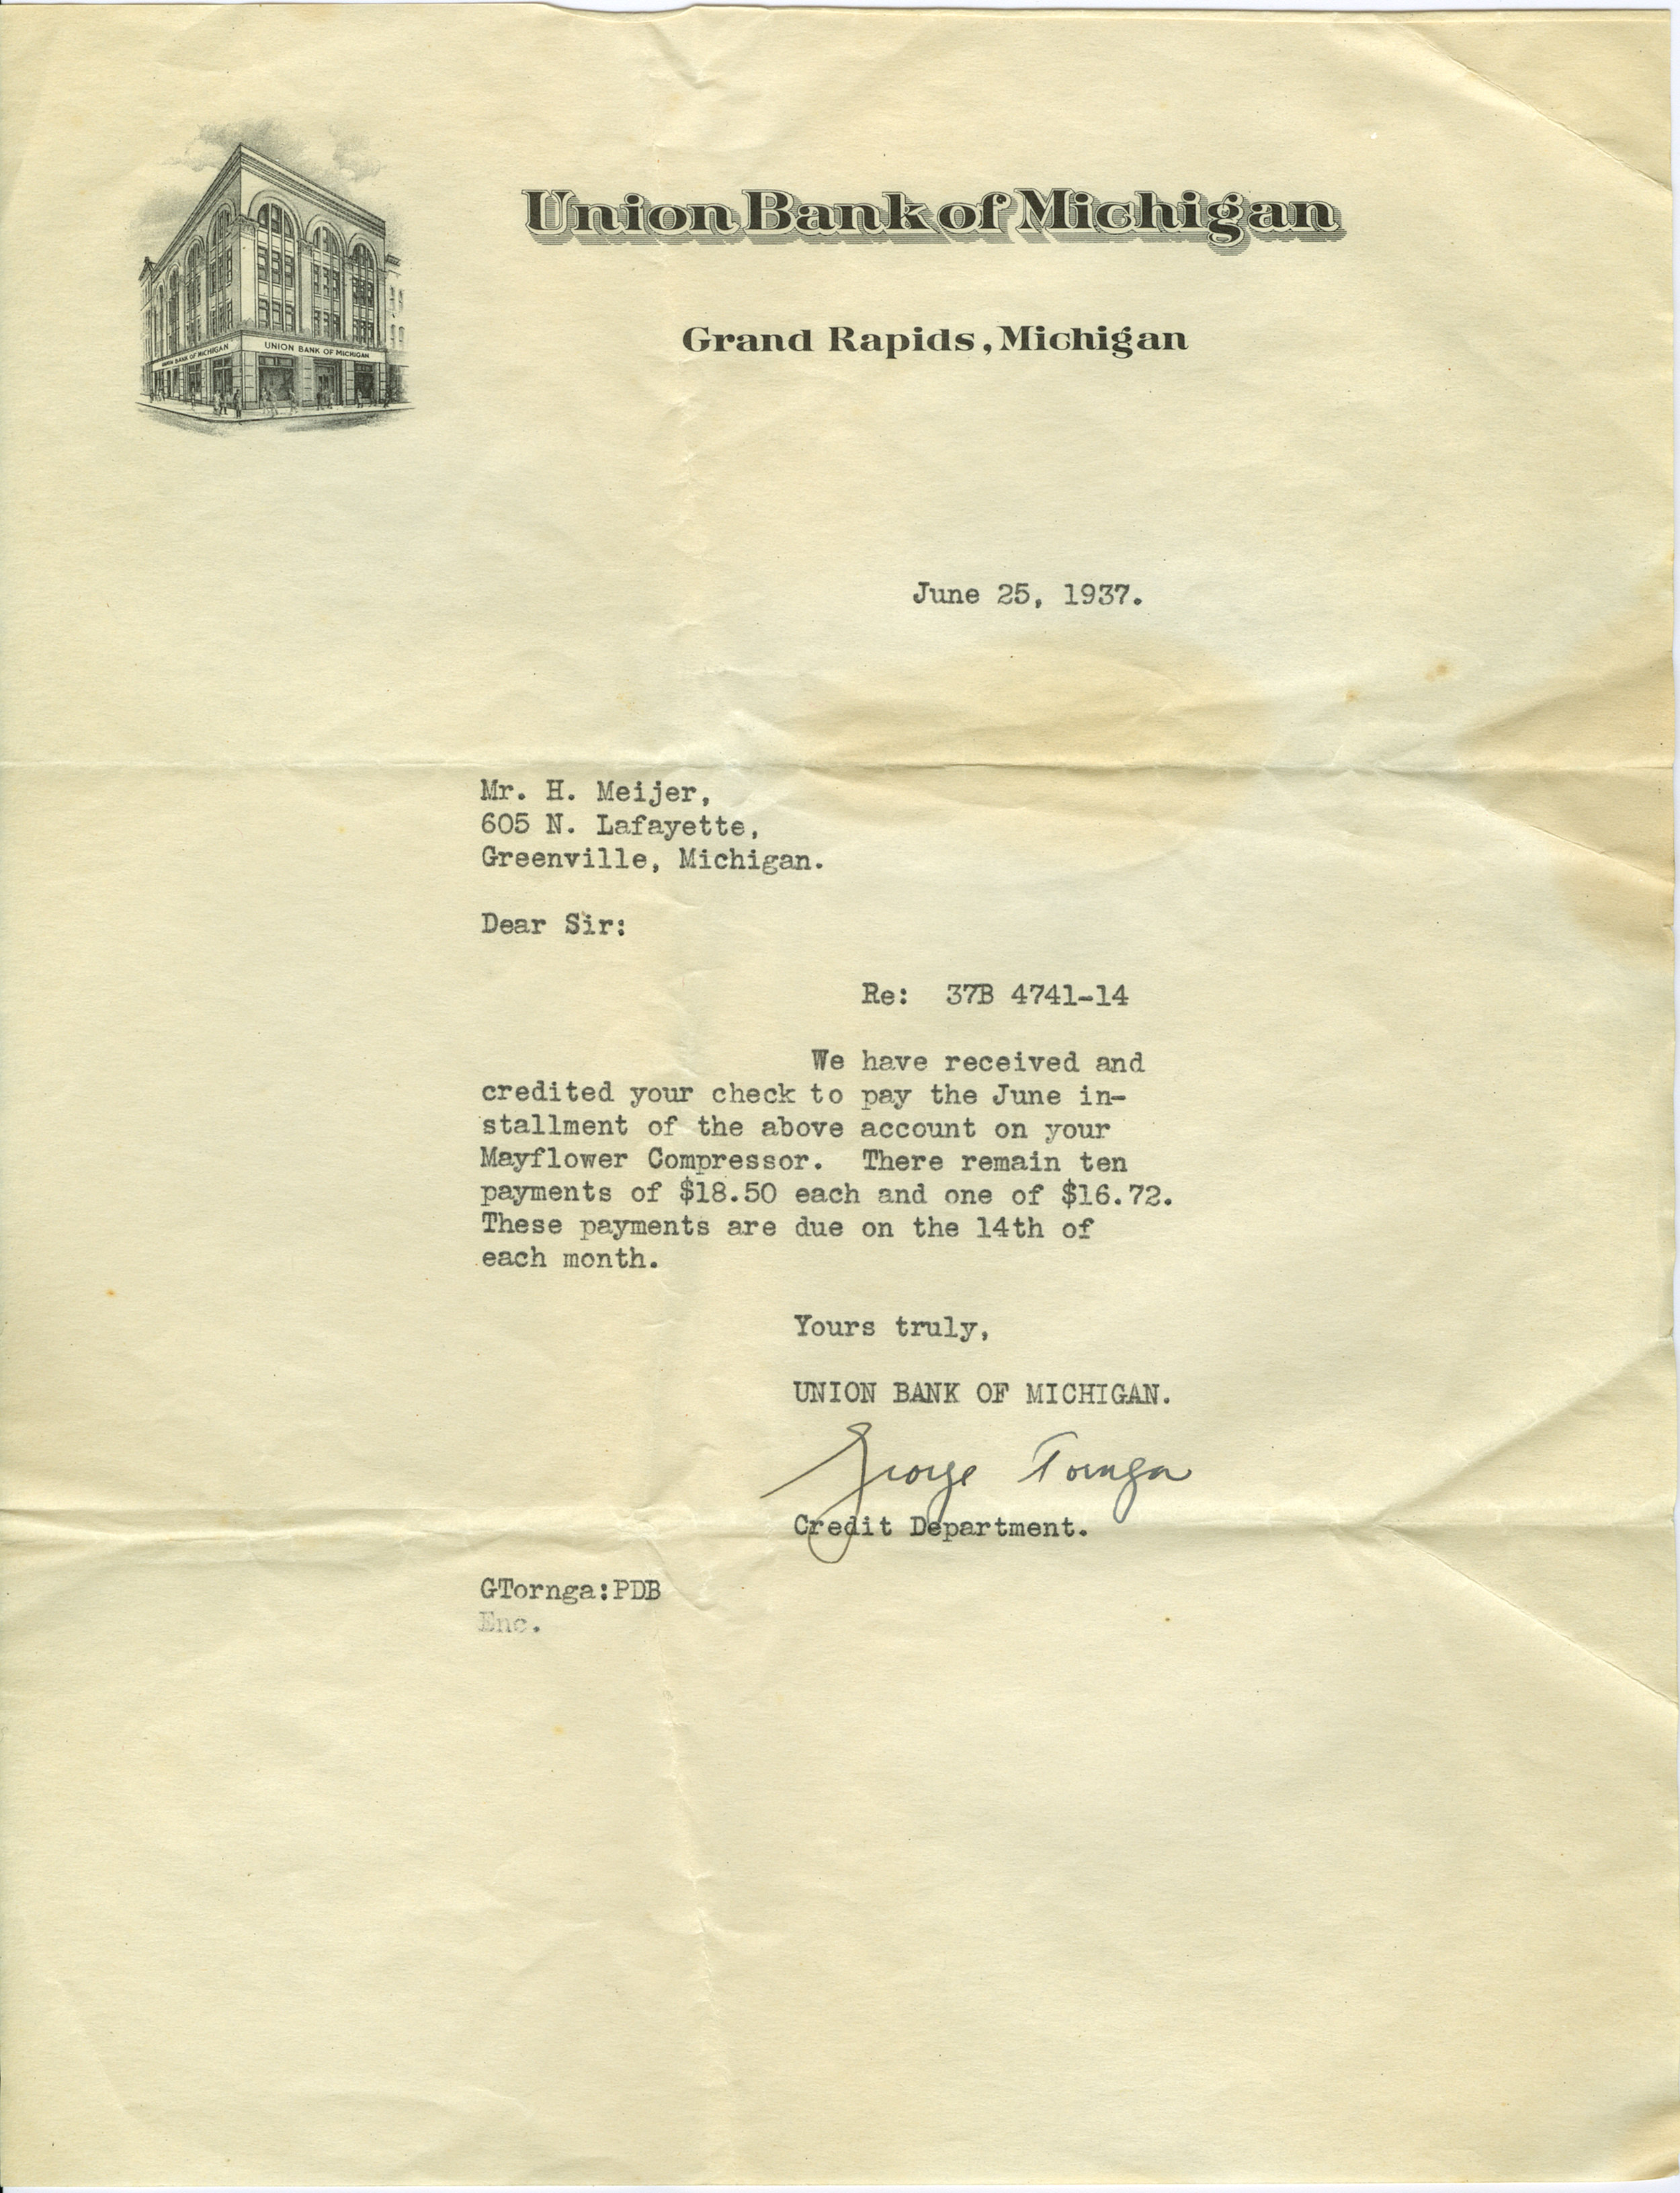 Union Bank to H. Meijer-6-25-370001.jpg